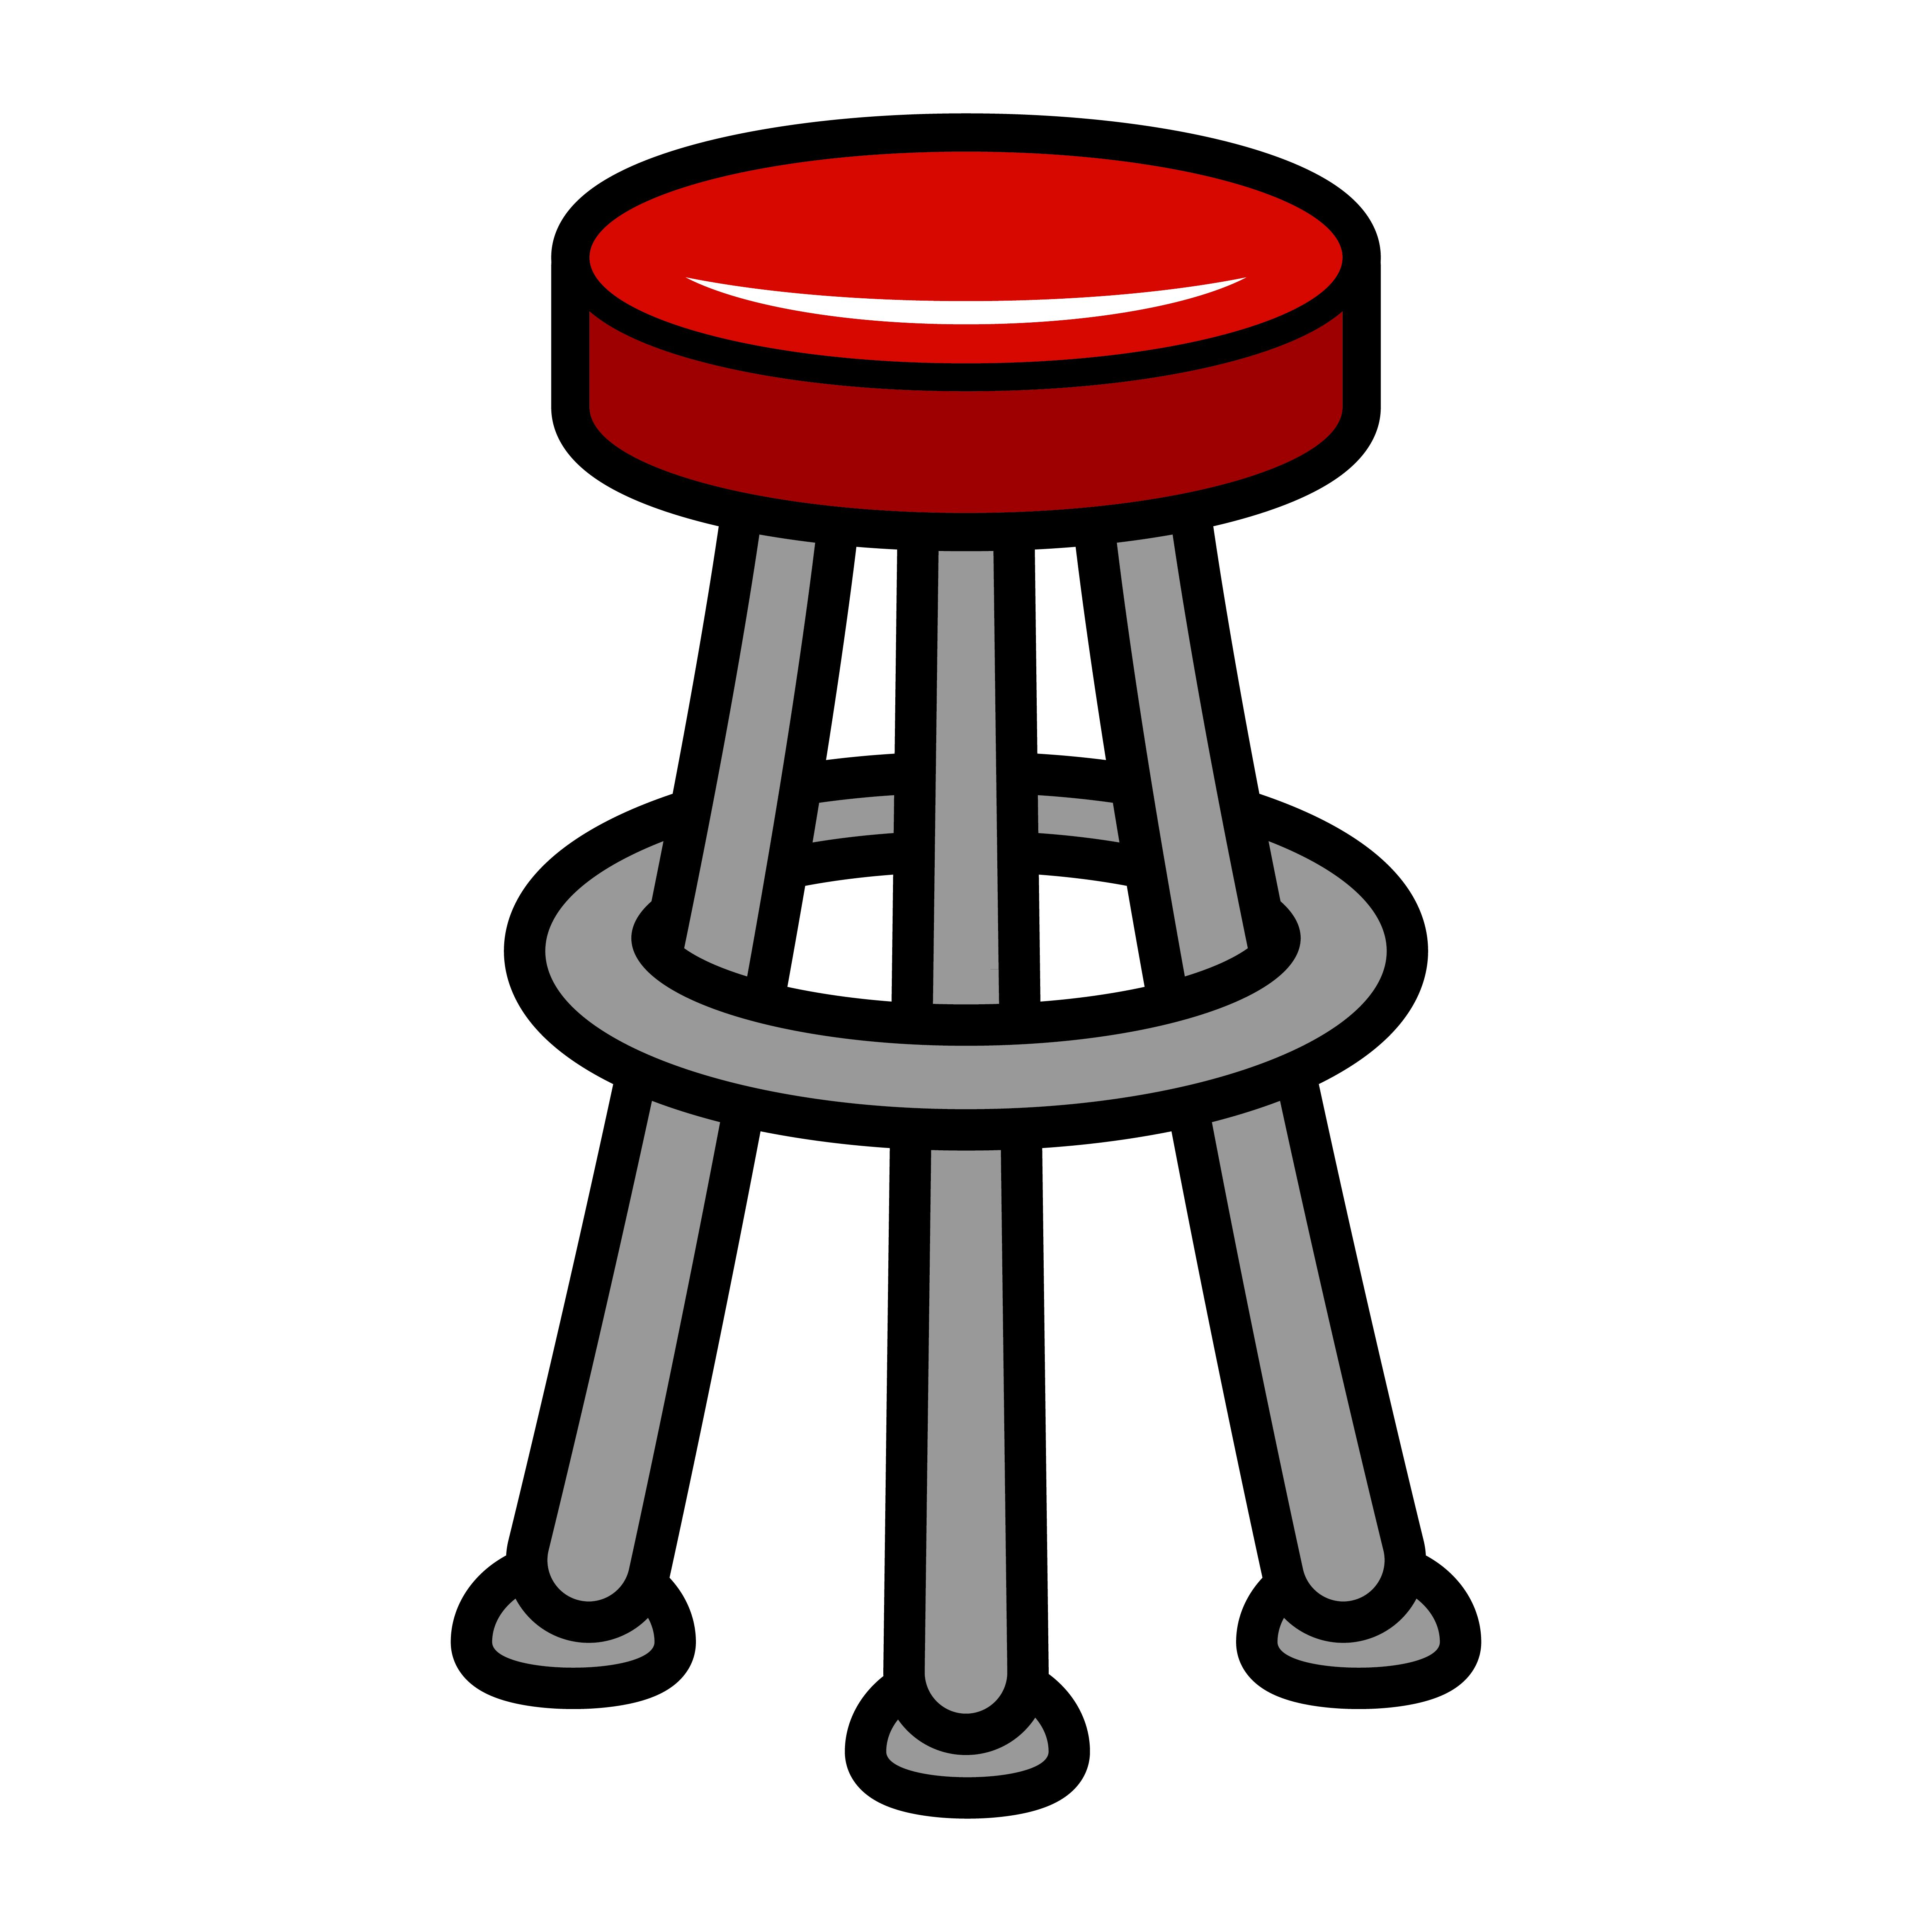 Stool Chair Seating Furniture Illustration - Download Free ...